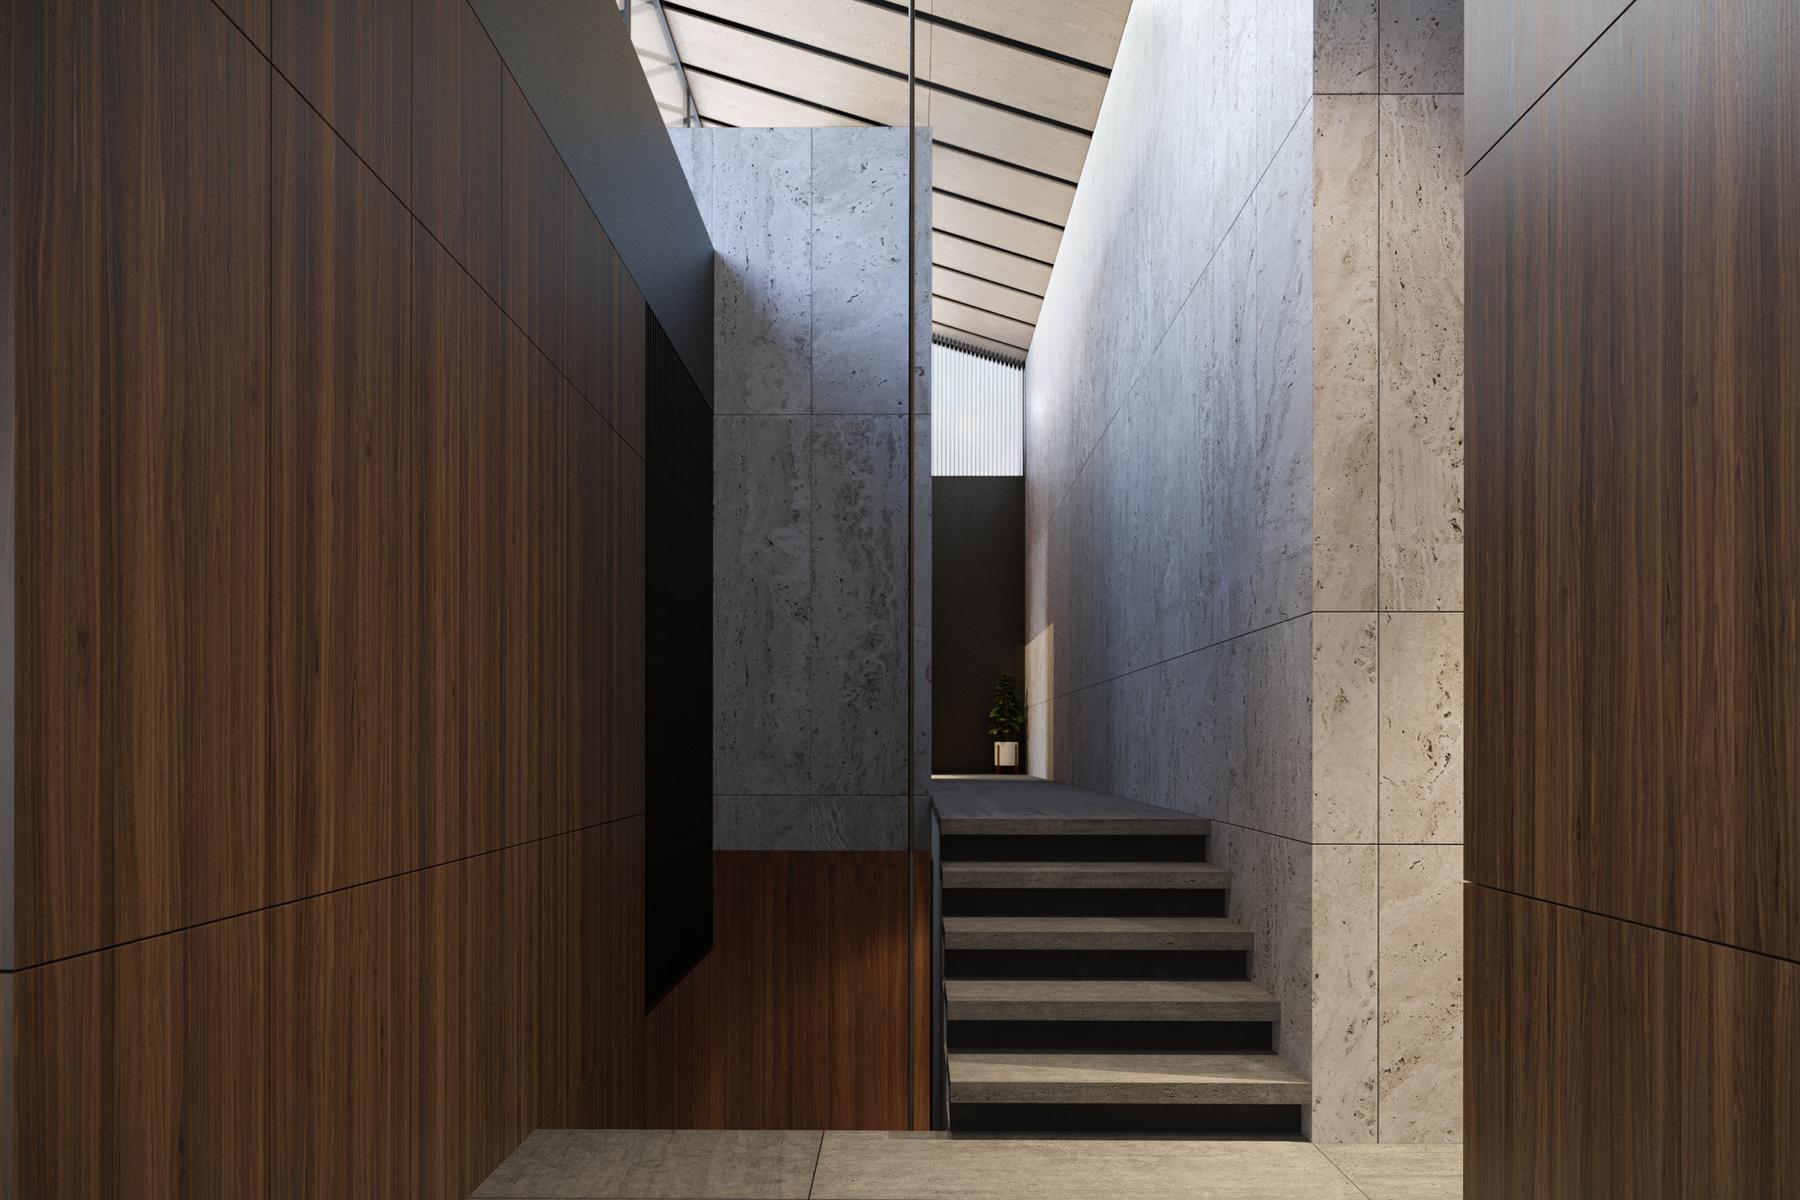 I_5_Interior_staircase.jpg